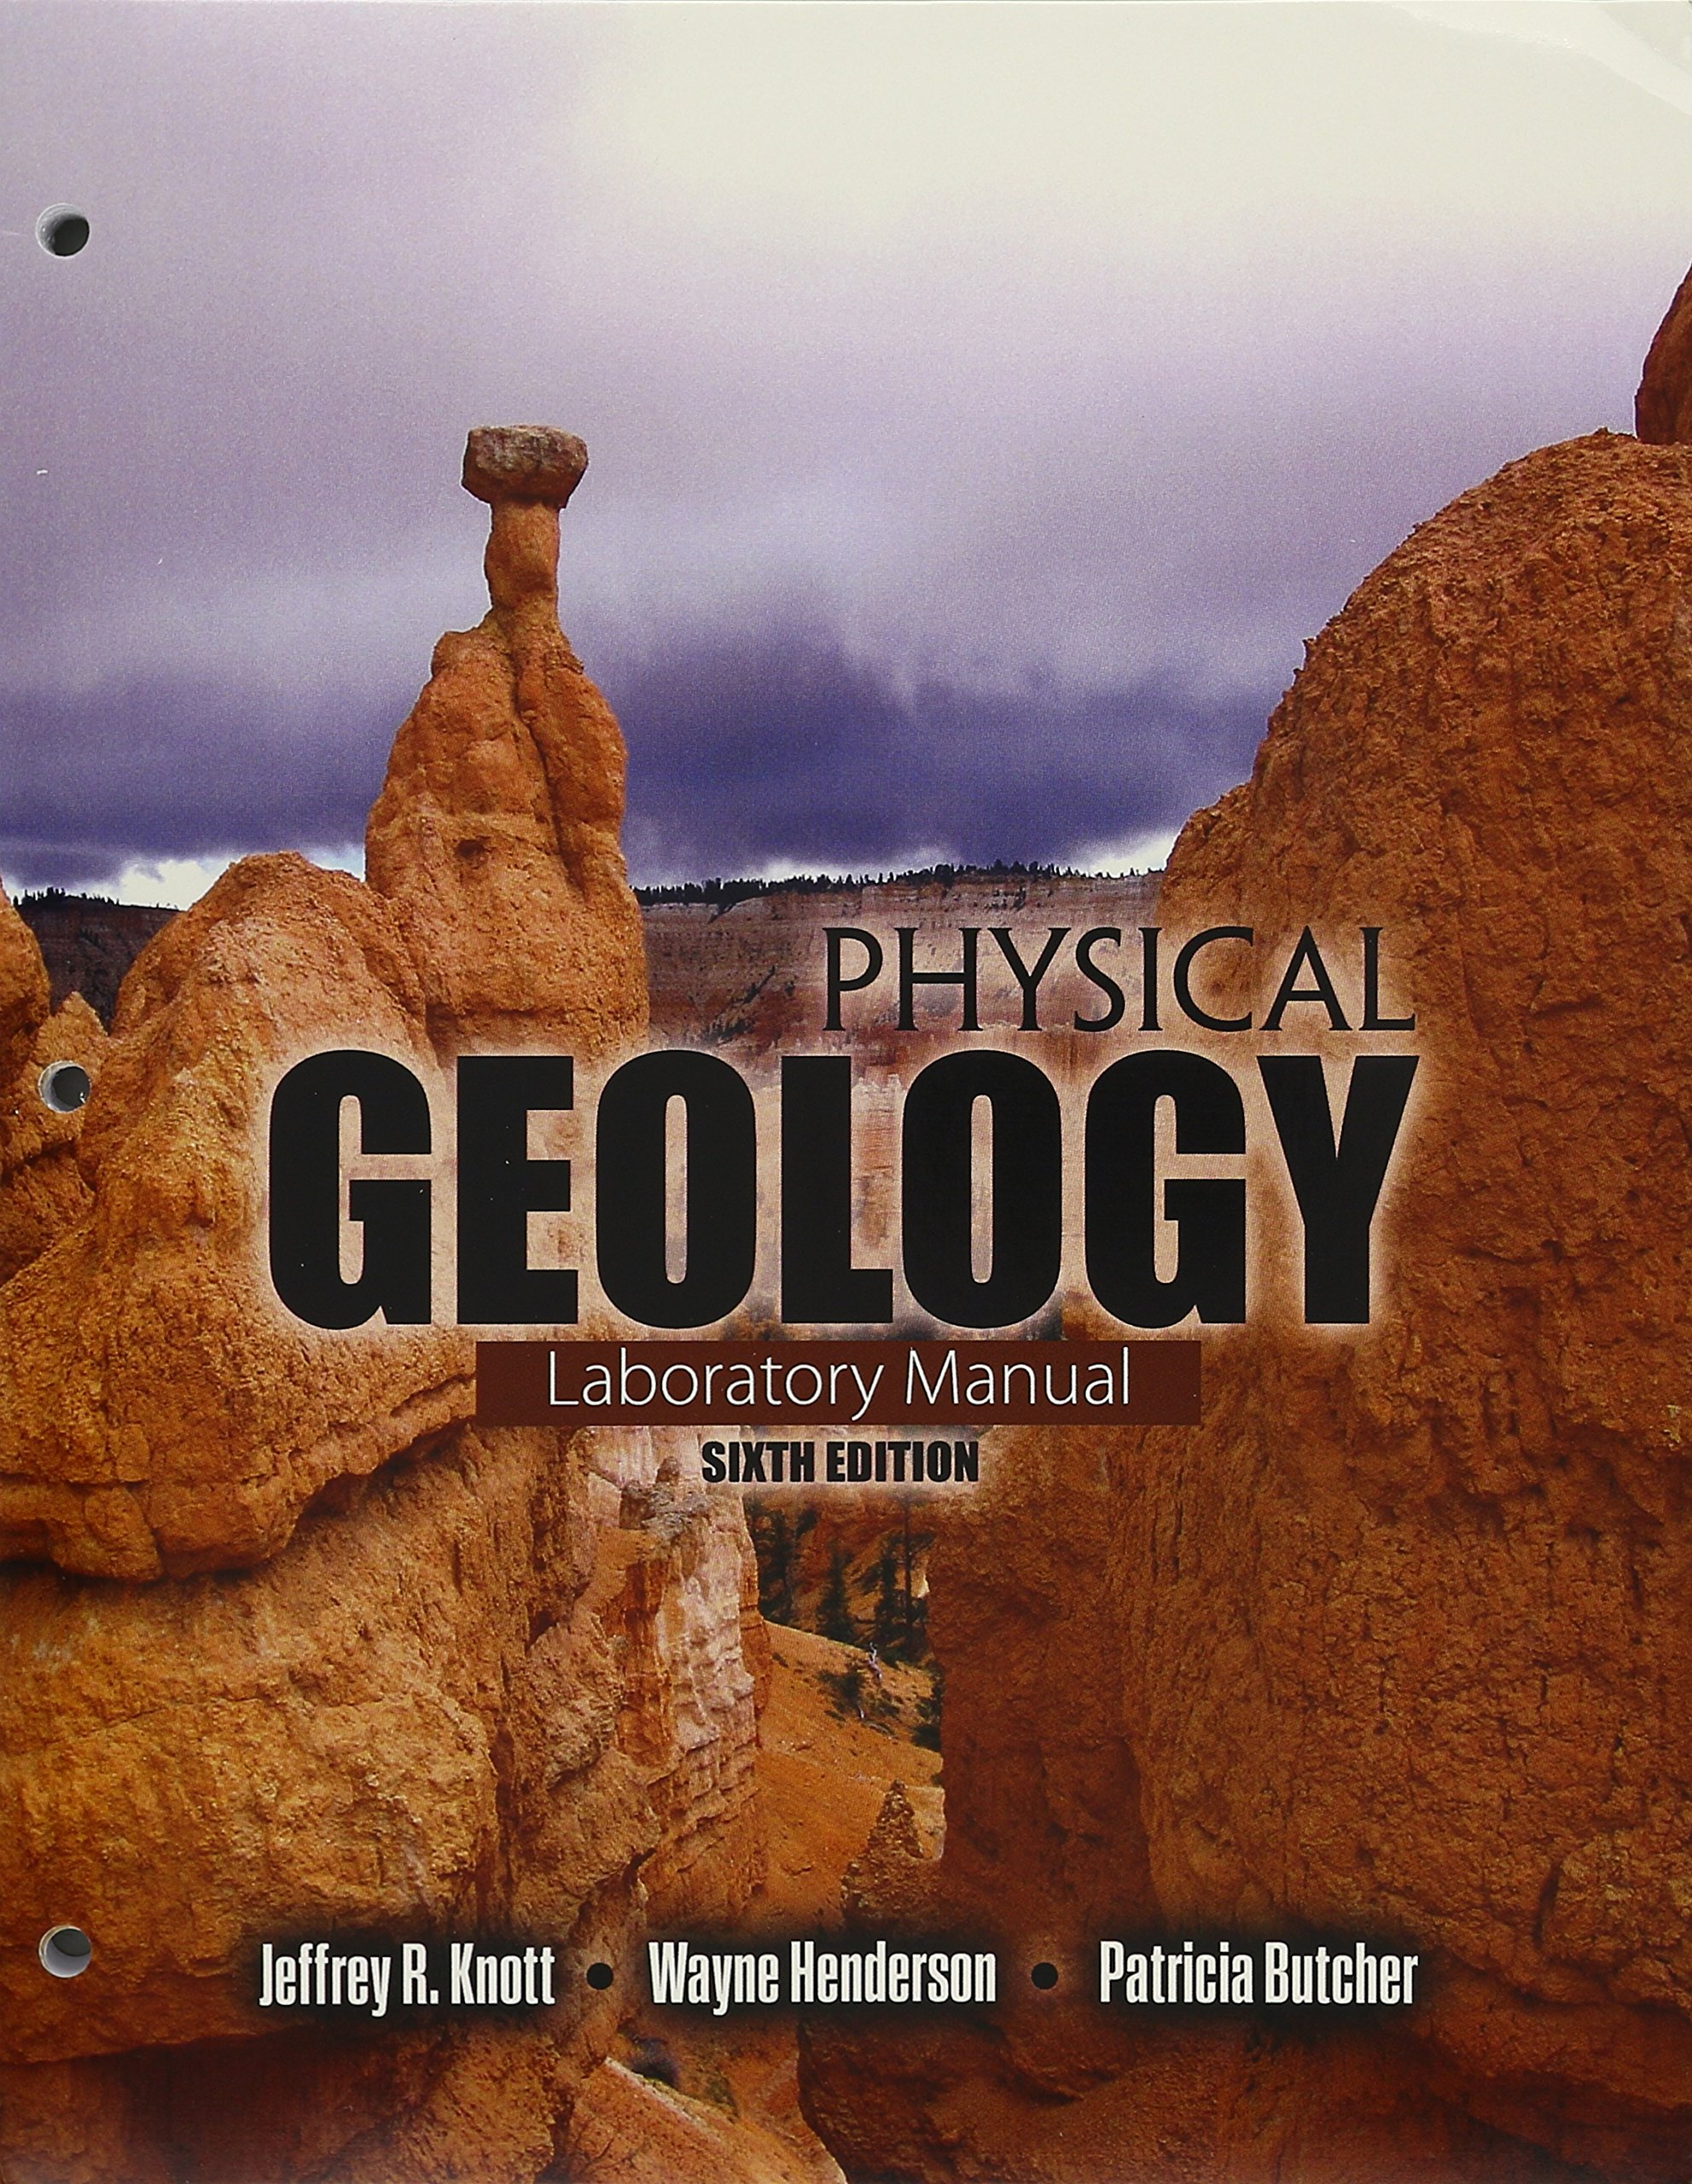 Physical Geology: Amazon.co.uk: Jeffrey R. Knott, Wayne Henderson, Patricia  Butcher, Kristin Weaver Bowman: 9781465296658: Books